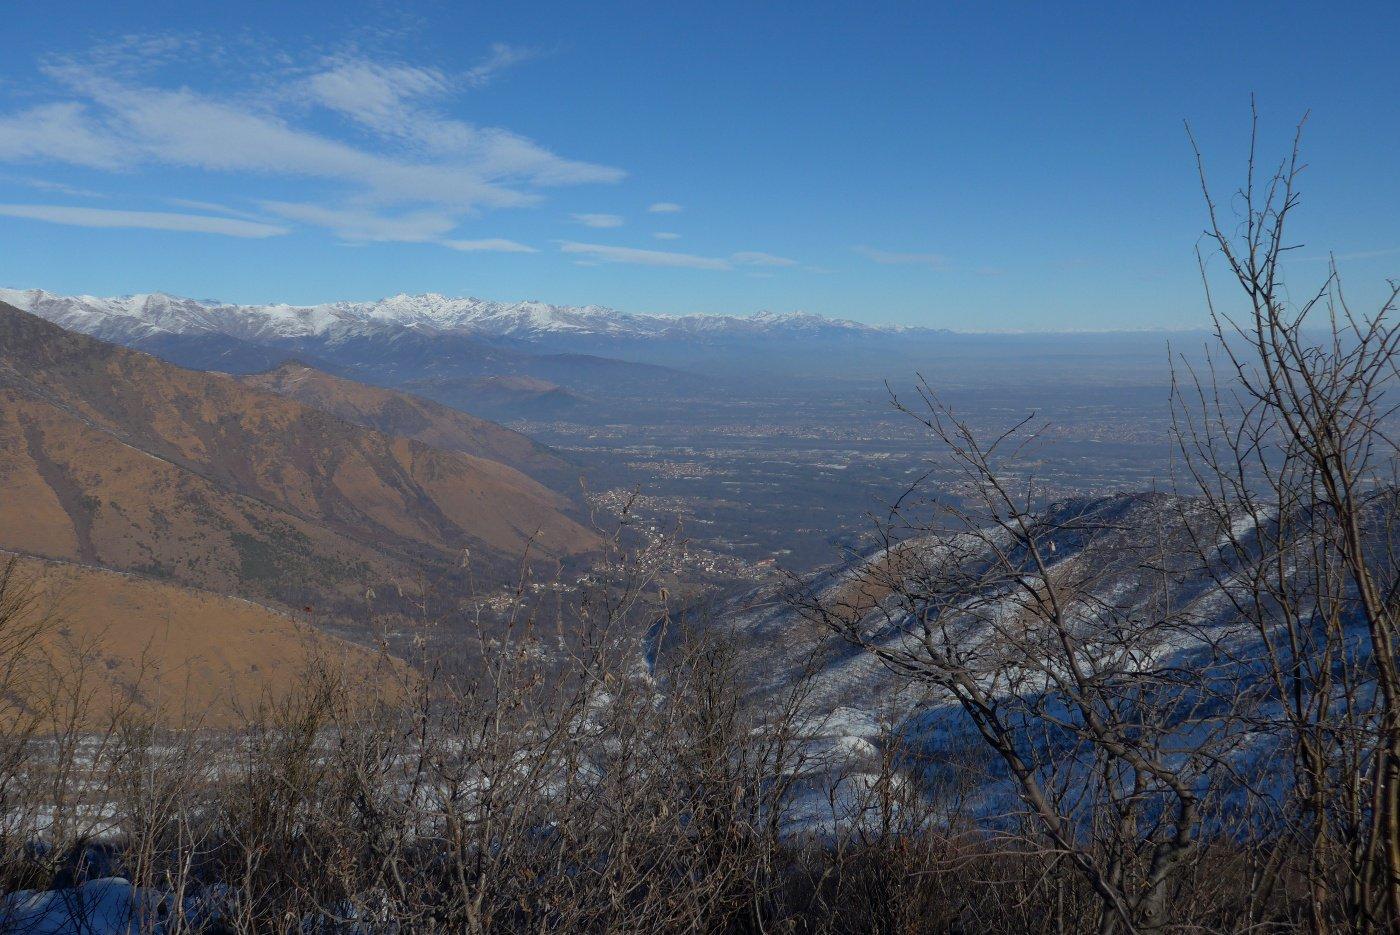 La Val Ceronda